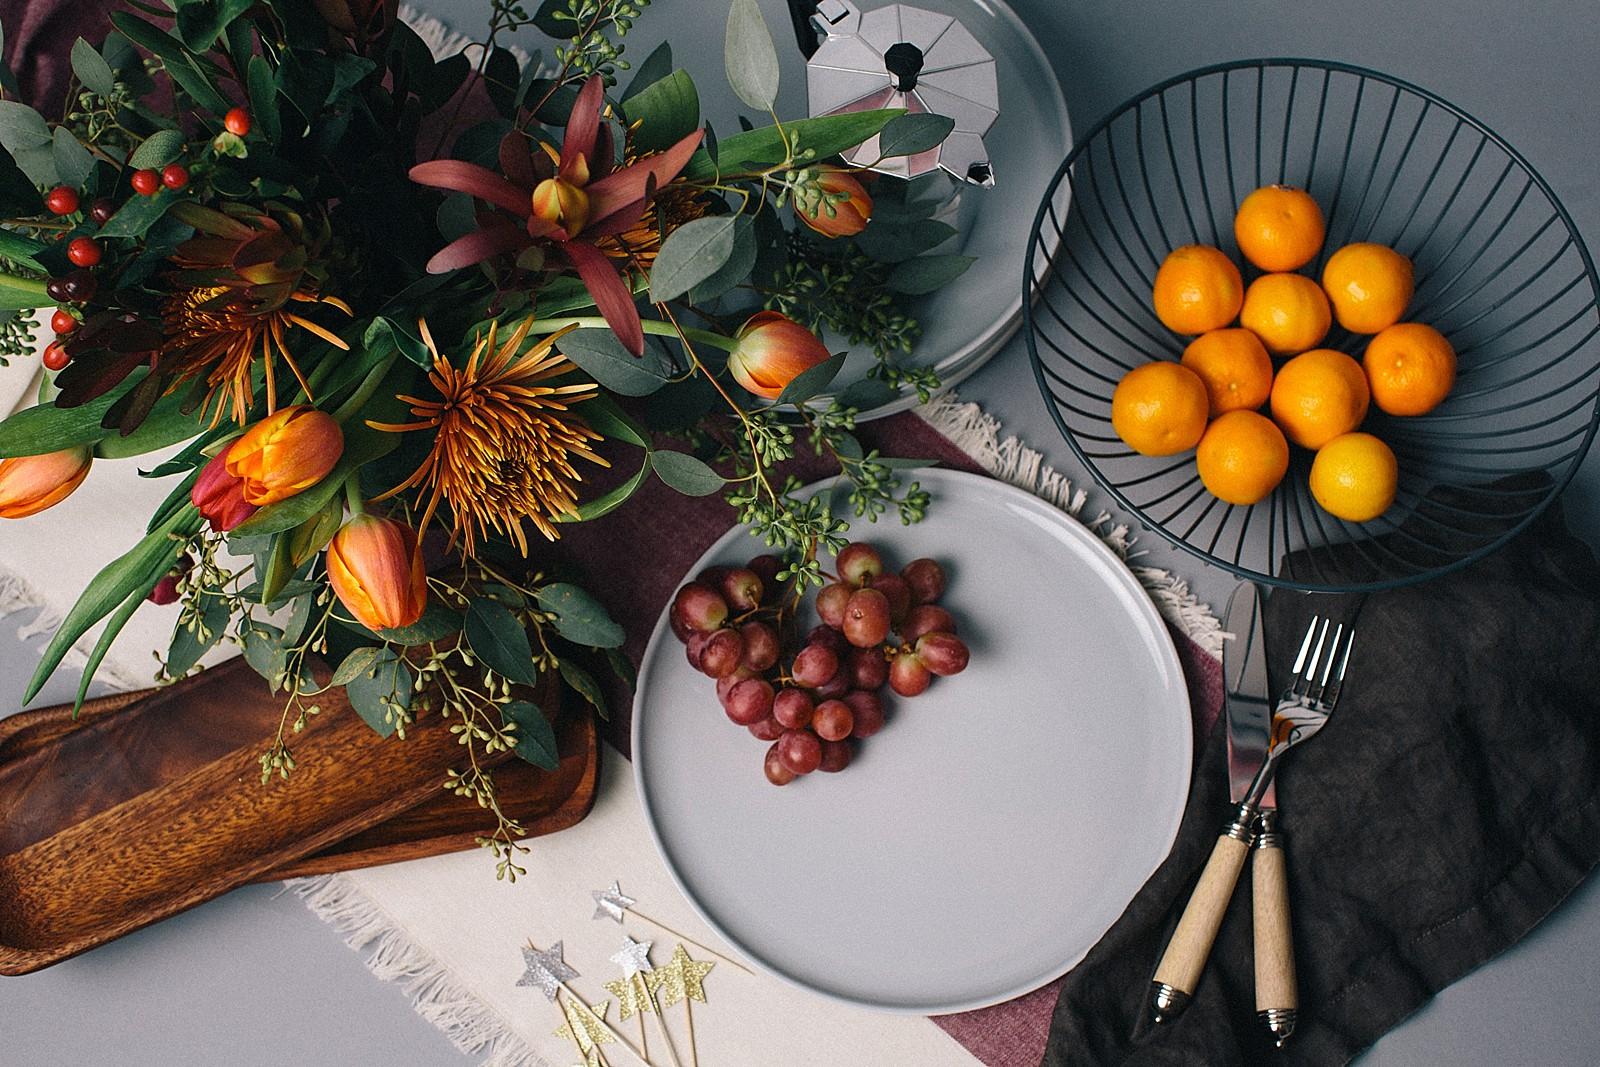 pro-flowers-burke-decor-thanksgiving-christmas-tablescape-idea-fall-popsugar-must-have-box-lifestyle-blogger-diana-elizabeth-blog-2203